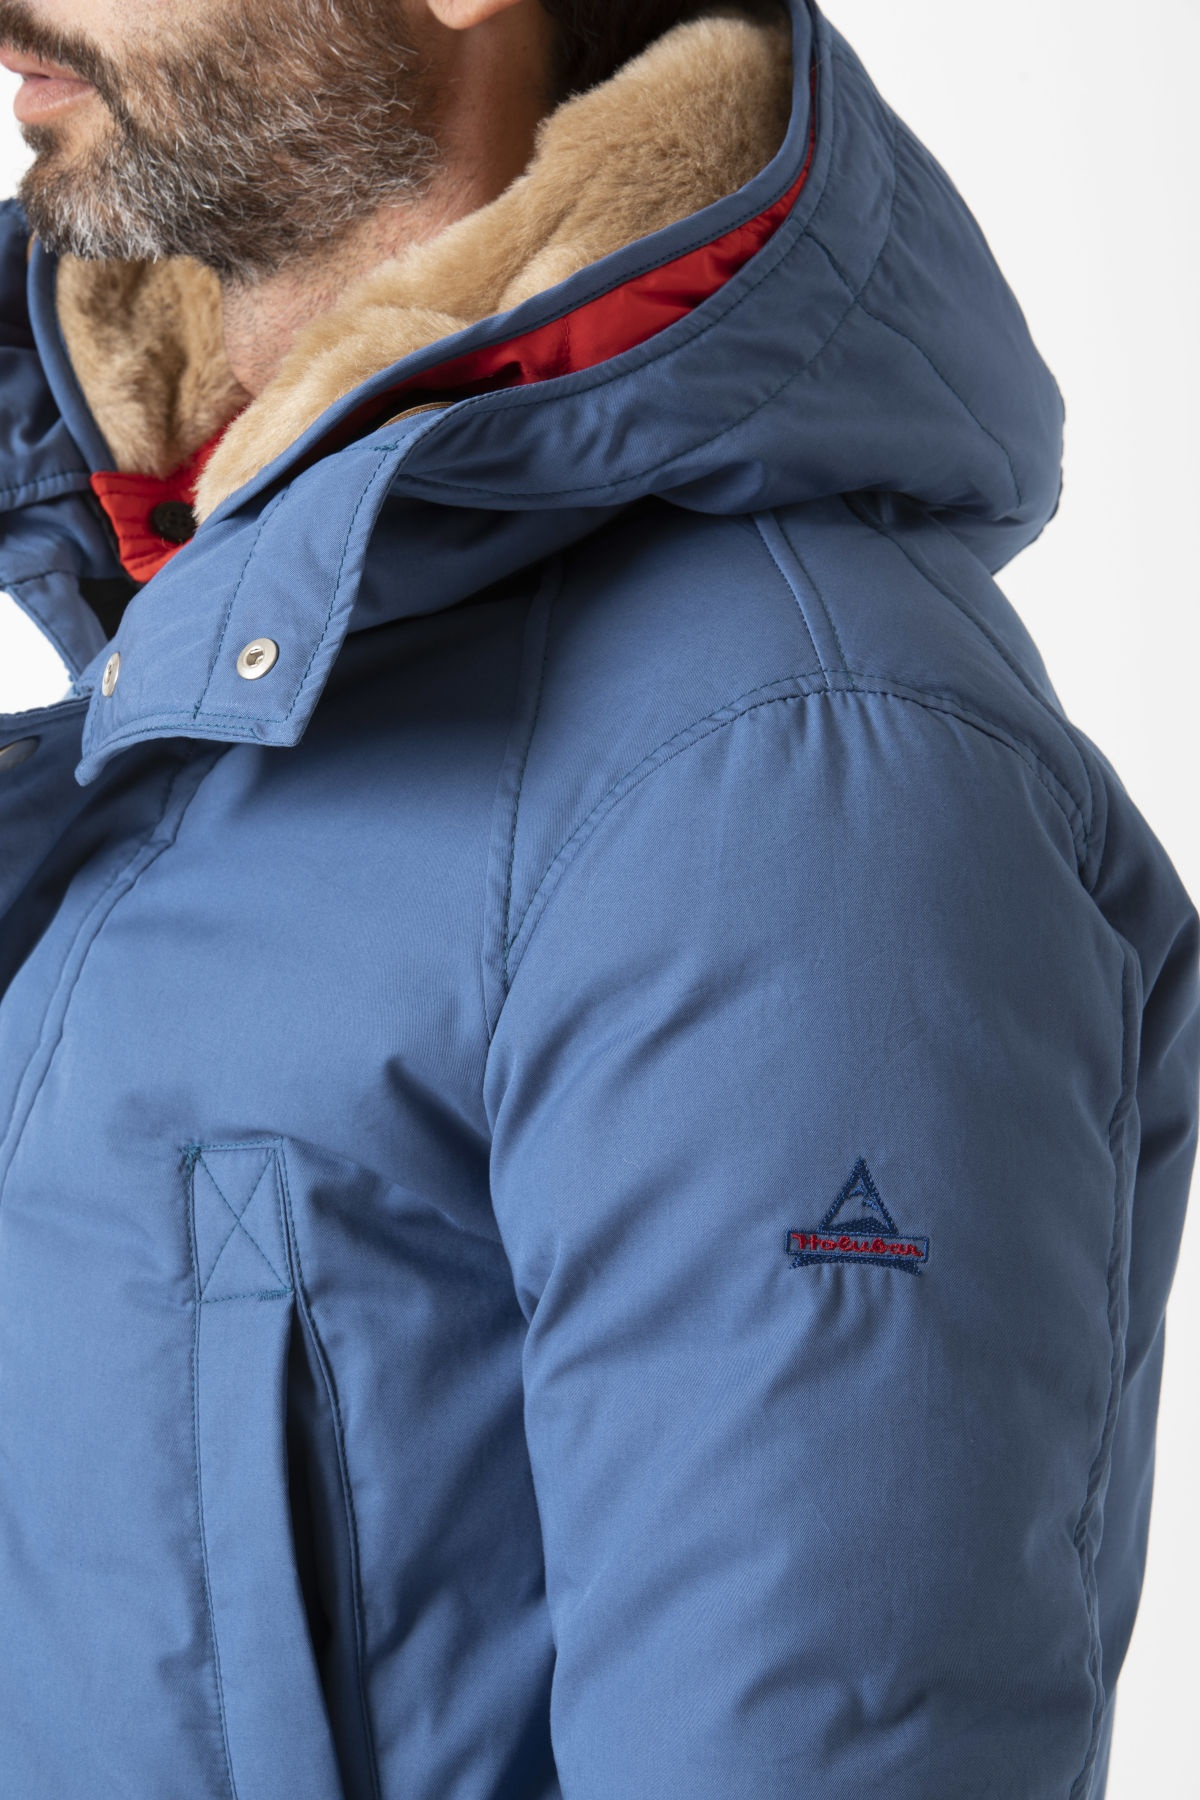 SHORT BOULDER Jacket for man HOLUBAR F/W 19-20